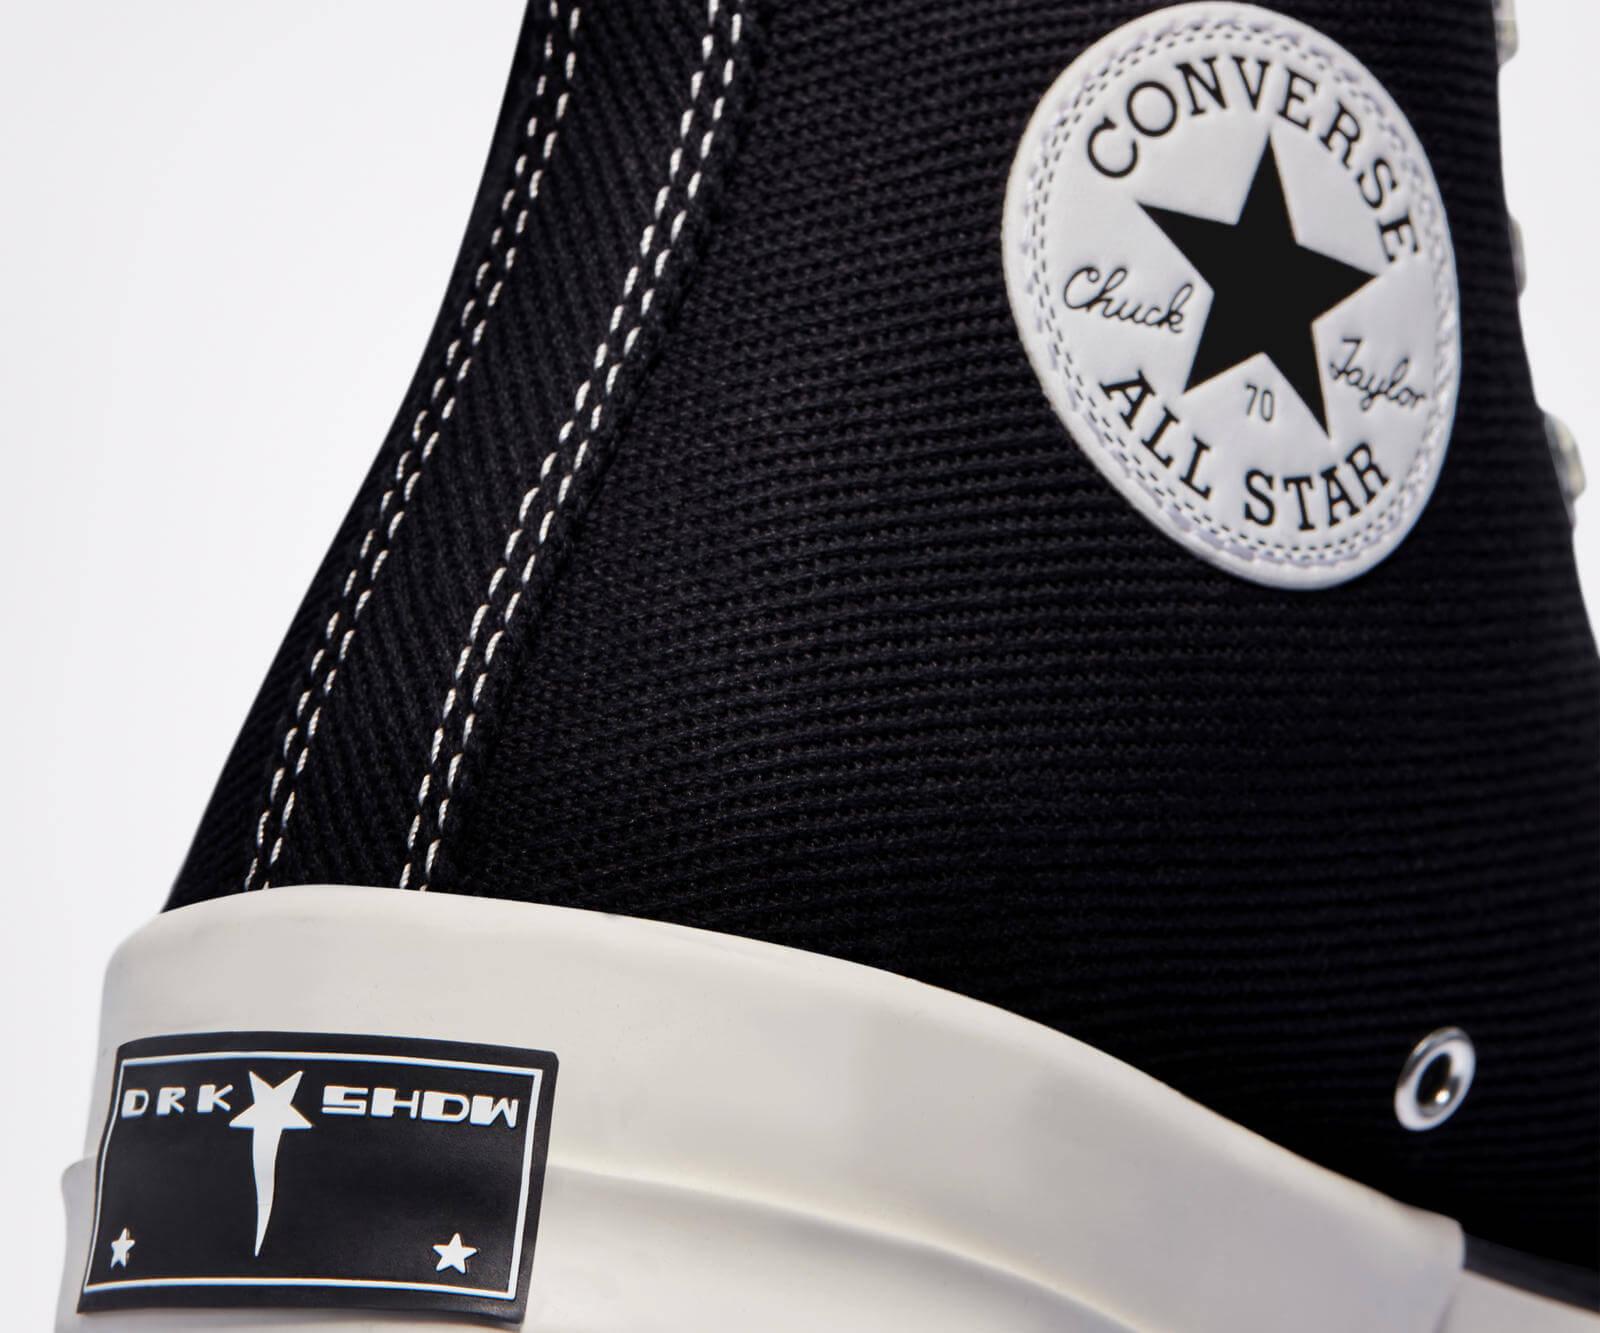 heel details of the Converse x Rick Owens - DRKSHDW - TurboDark Chuck 70 High